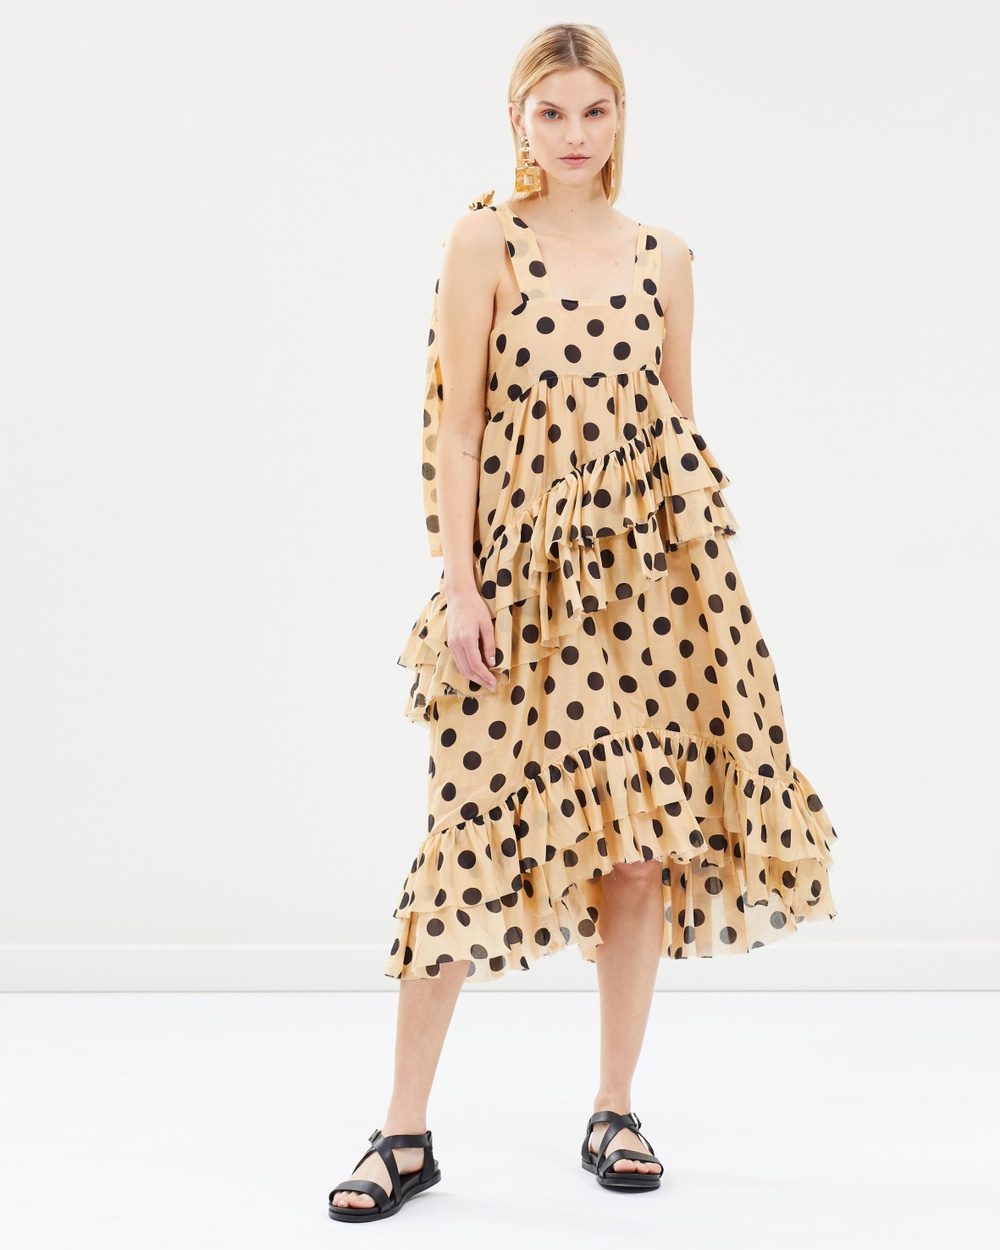 Lee Mathews Barley Minnie Spot Ruffle Apron Dress